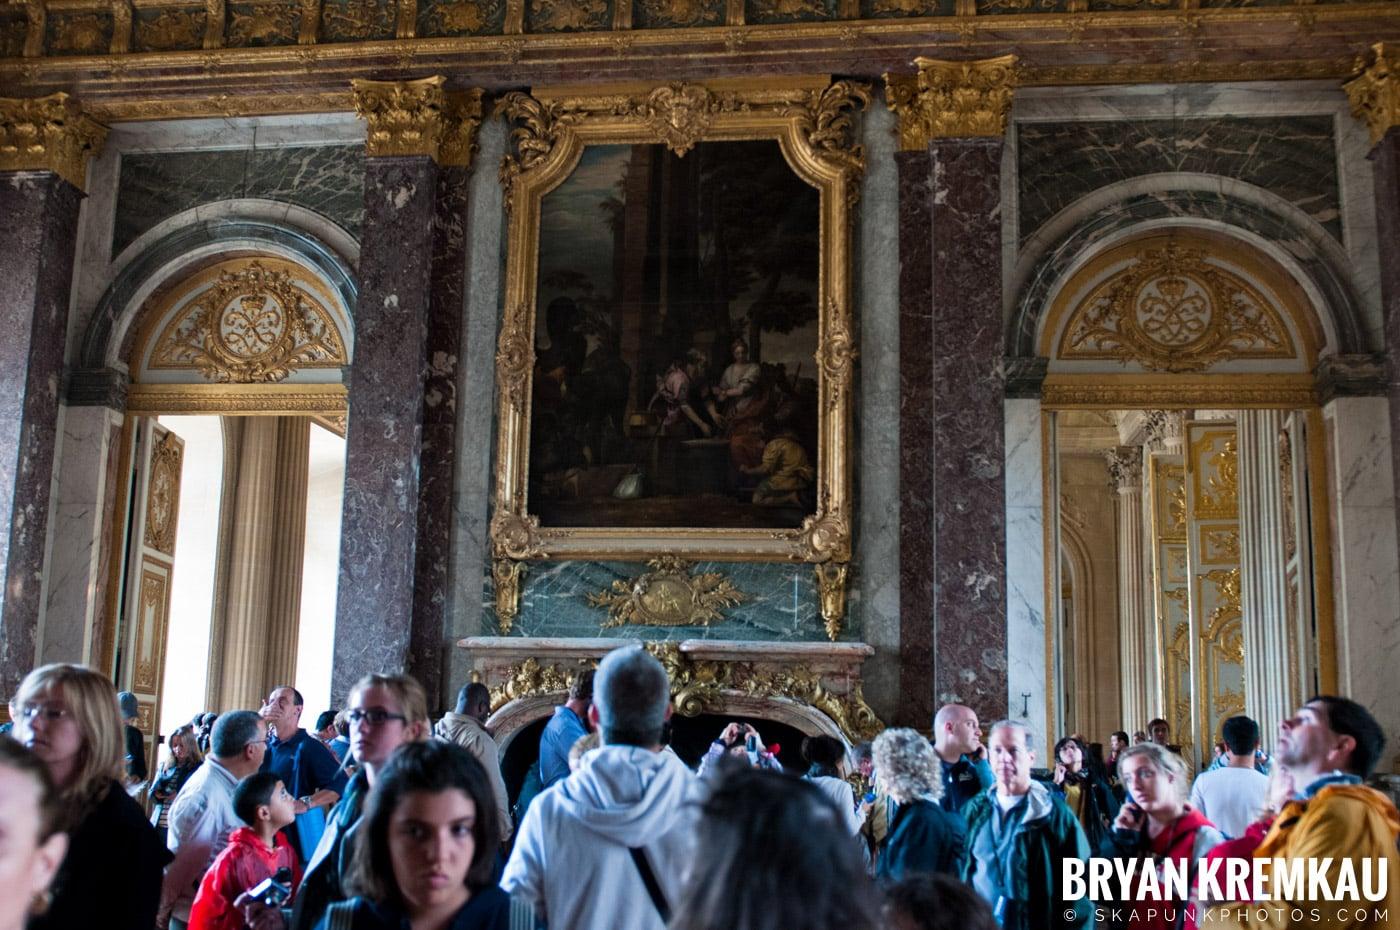 Paris, France Honeymoon - Day 2 - 7.19.11 (48)